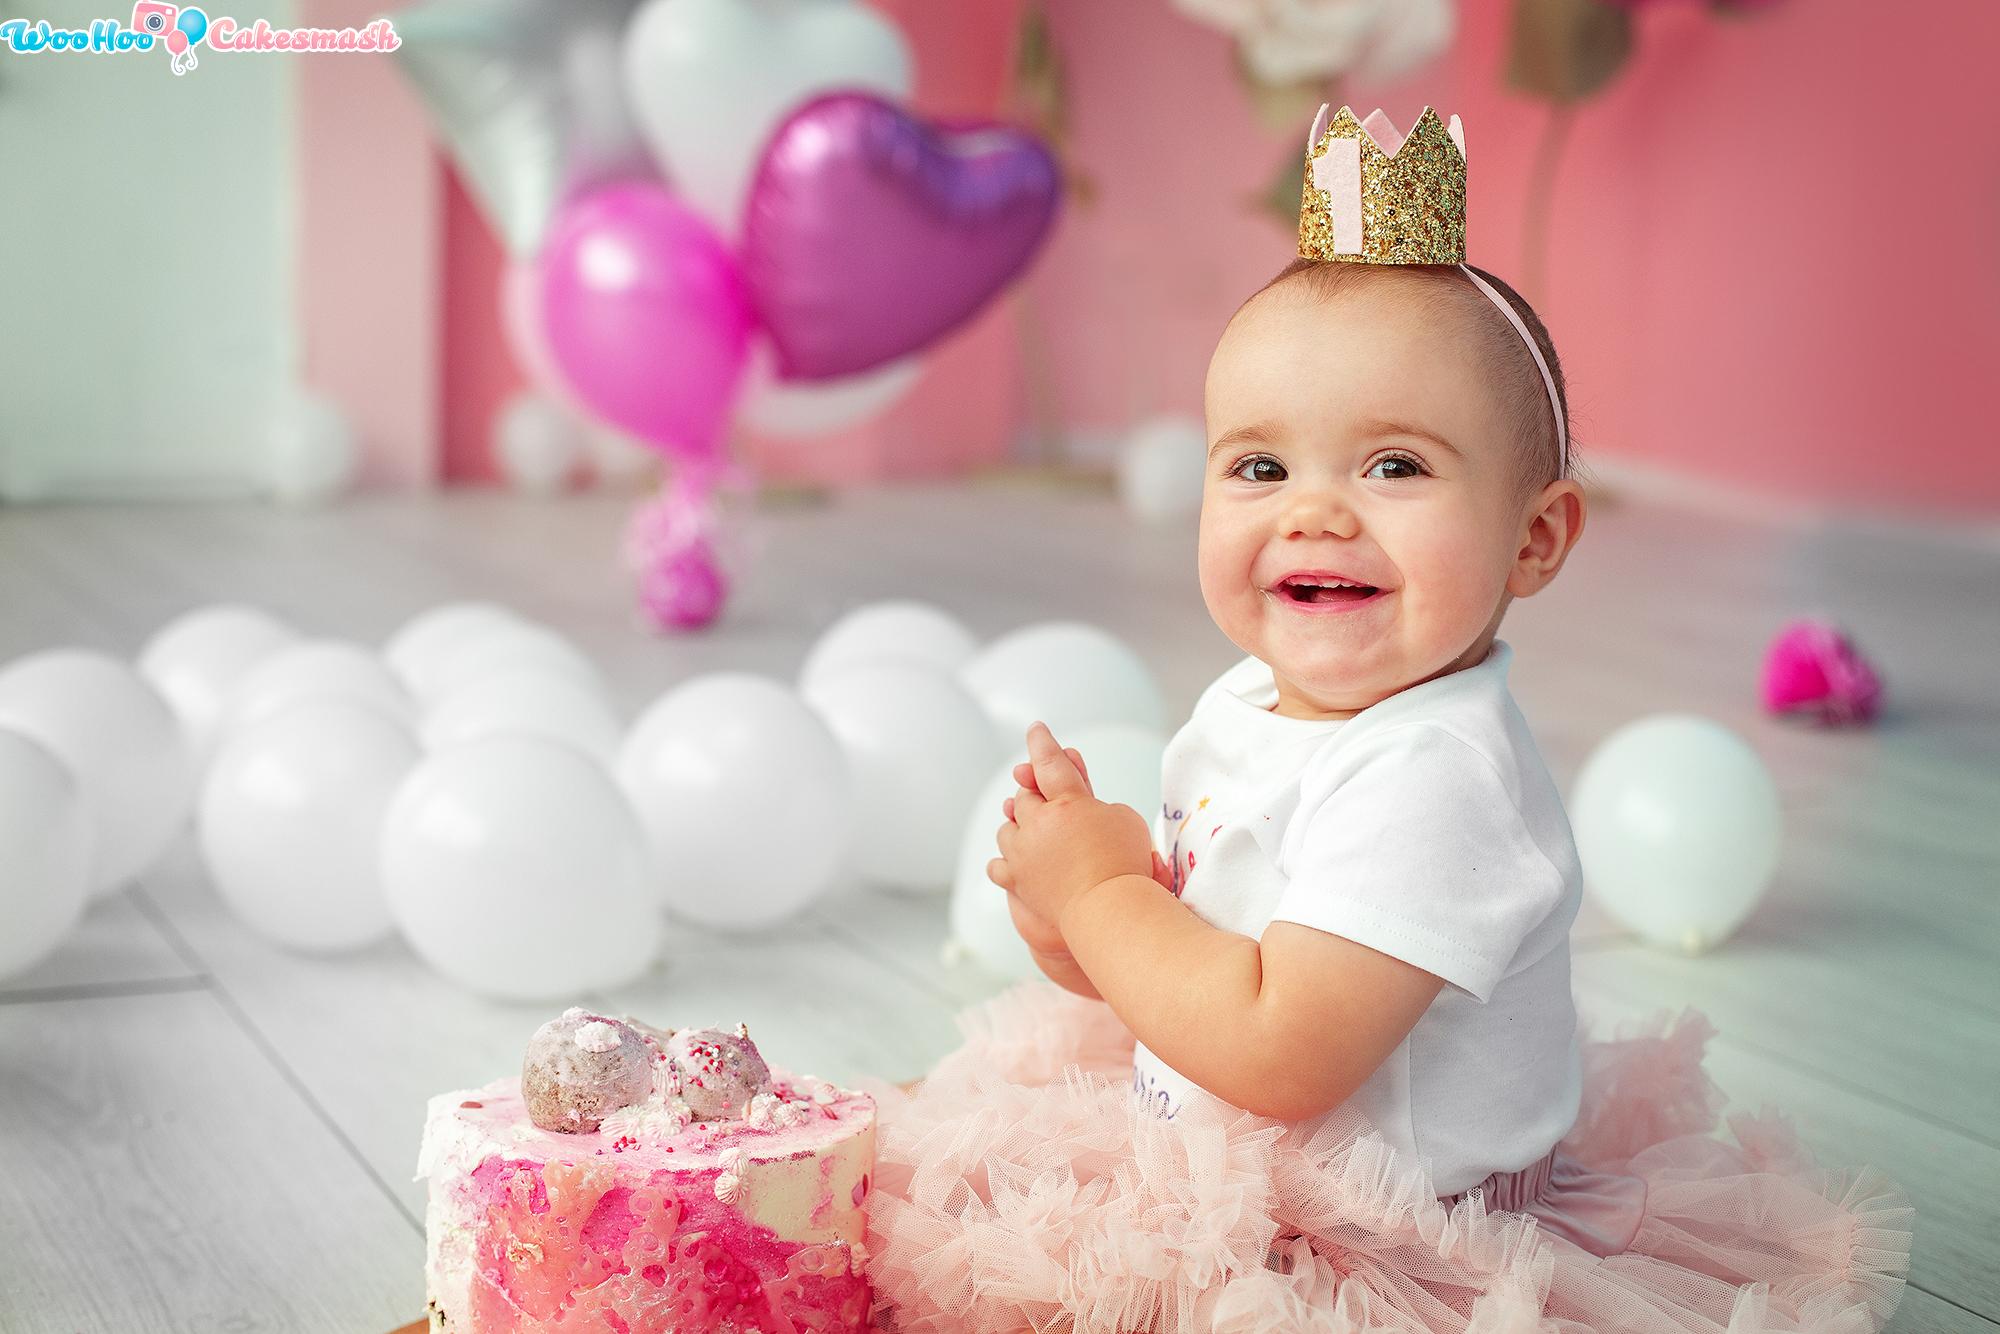 woohoo_cakesmash_MARIYA_the_princess_7